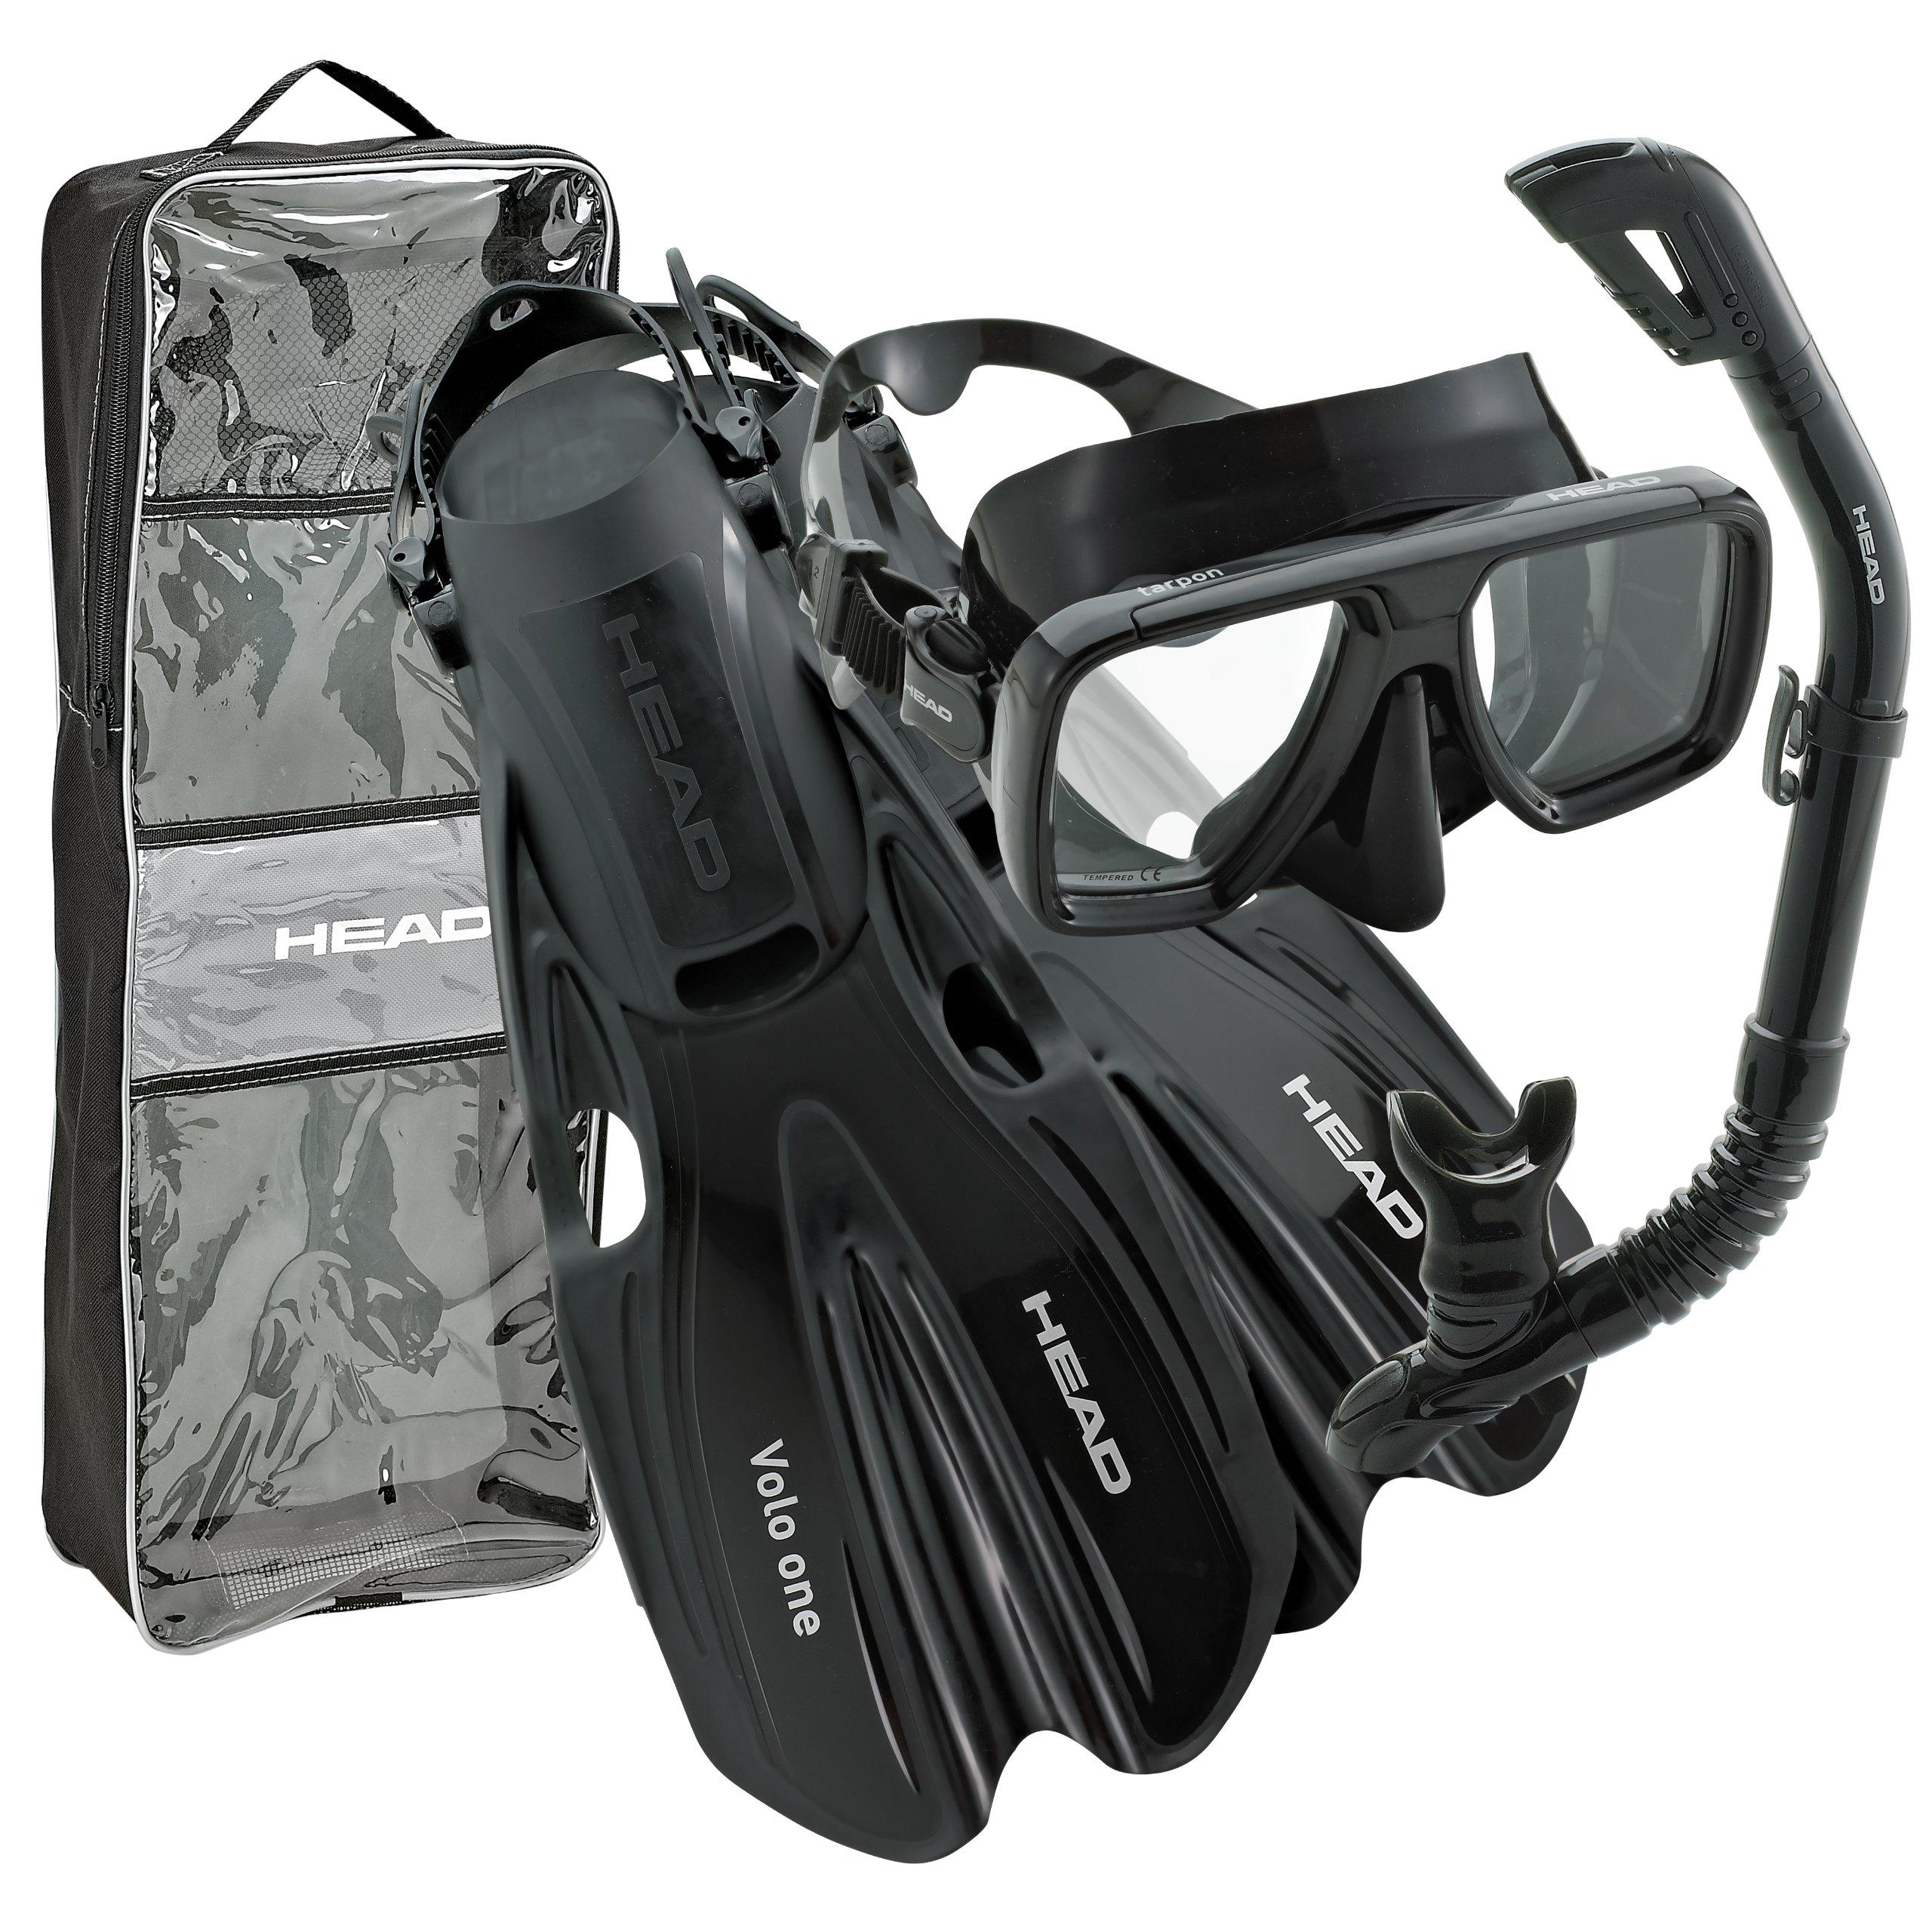 HEAD by Mares Tarpon Travel Friendly Premium Mask Fin Snorkel Set, Black, Large, (10-13)